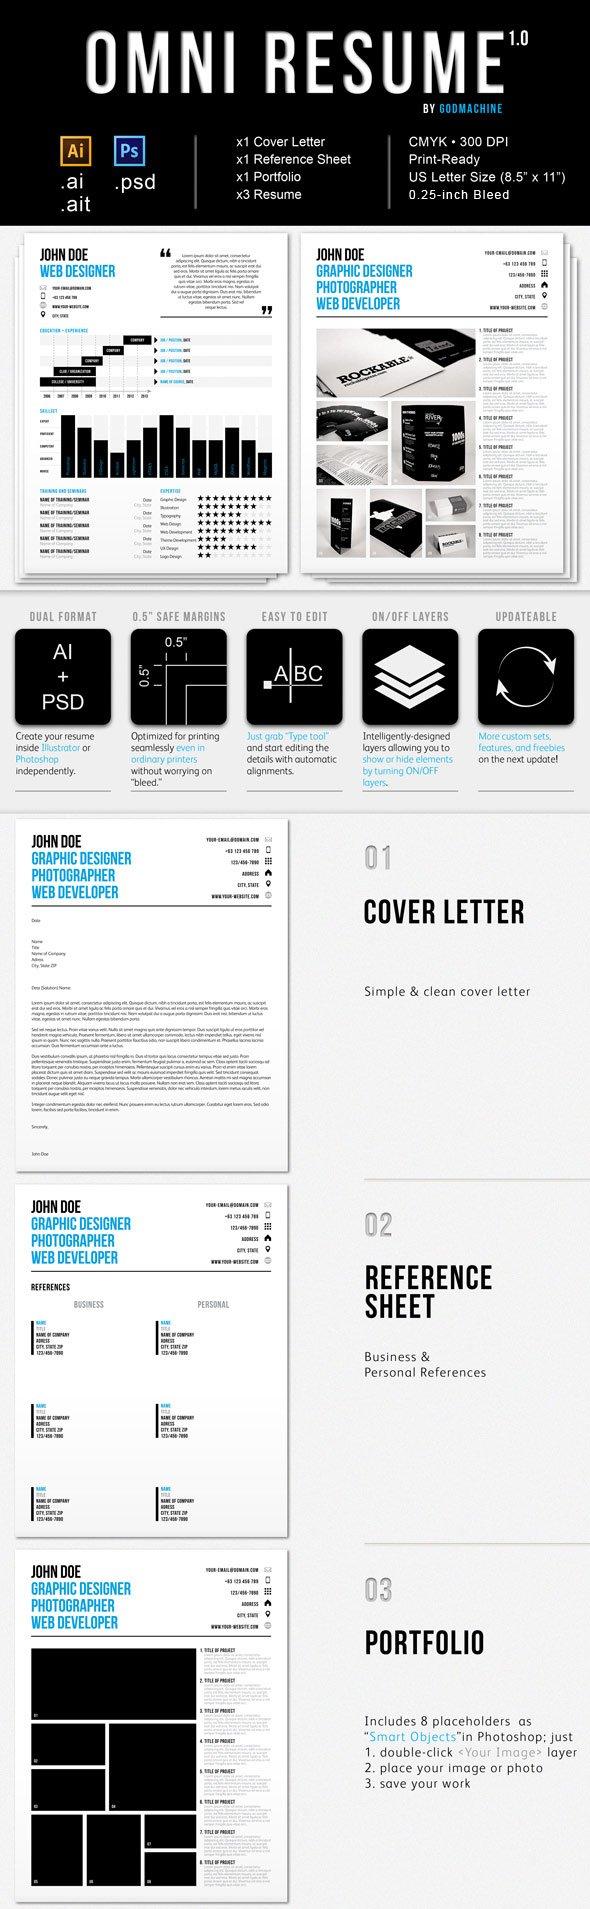 Omni Infographic Resume With Folio